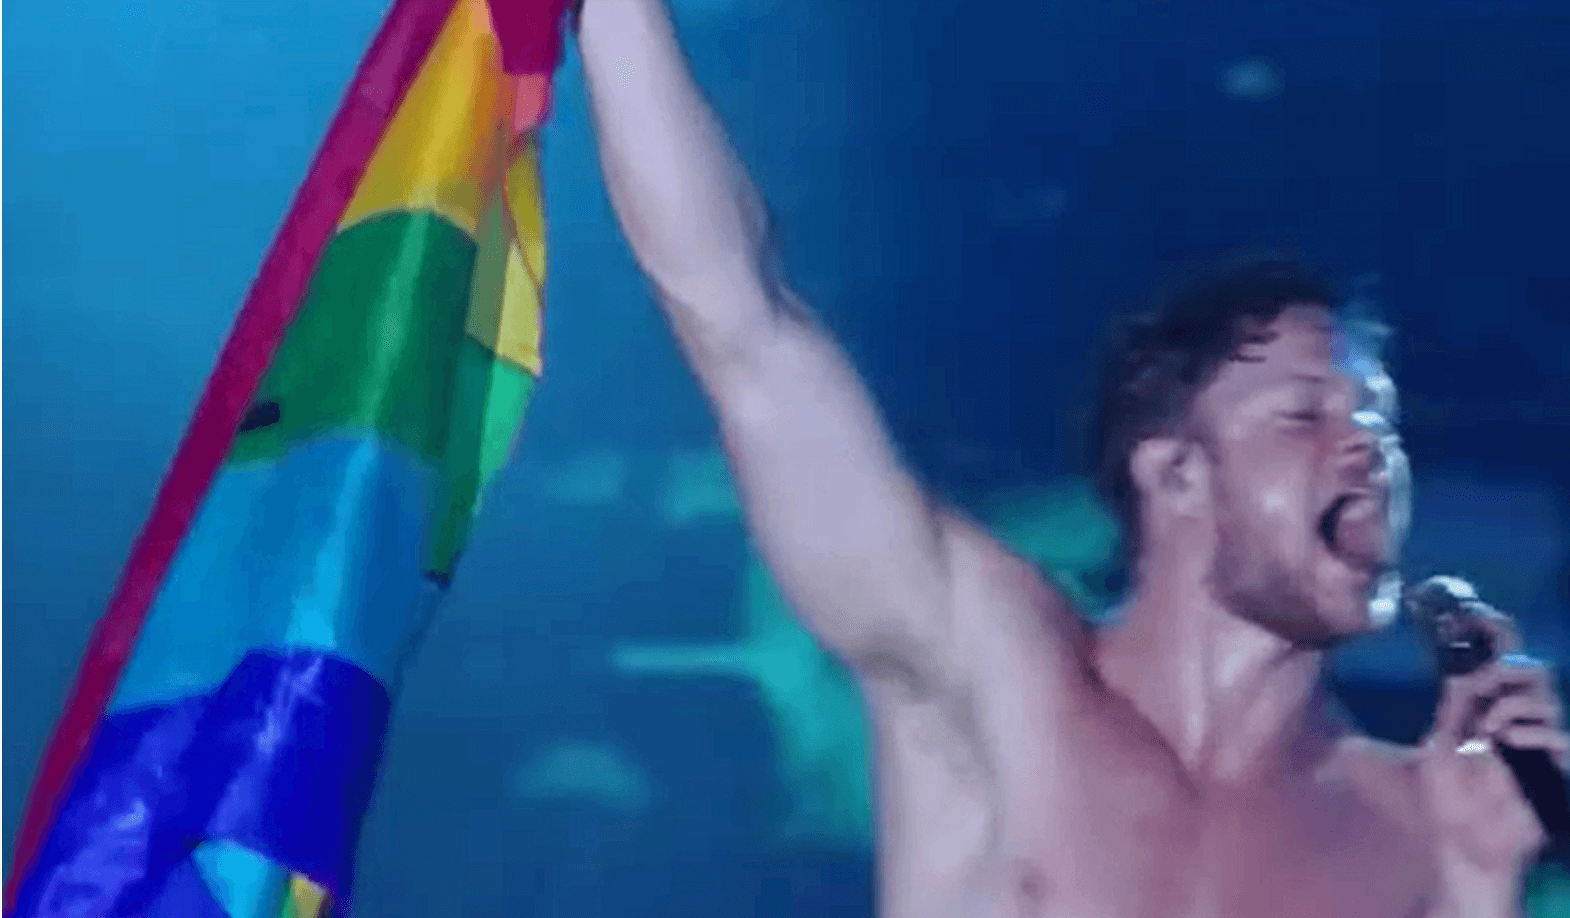 imagine dragons dan reynolds rainbow flag